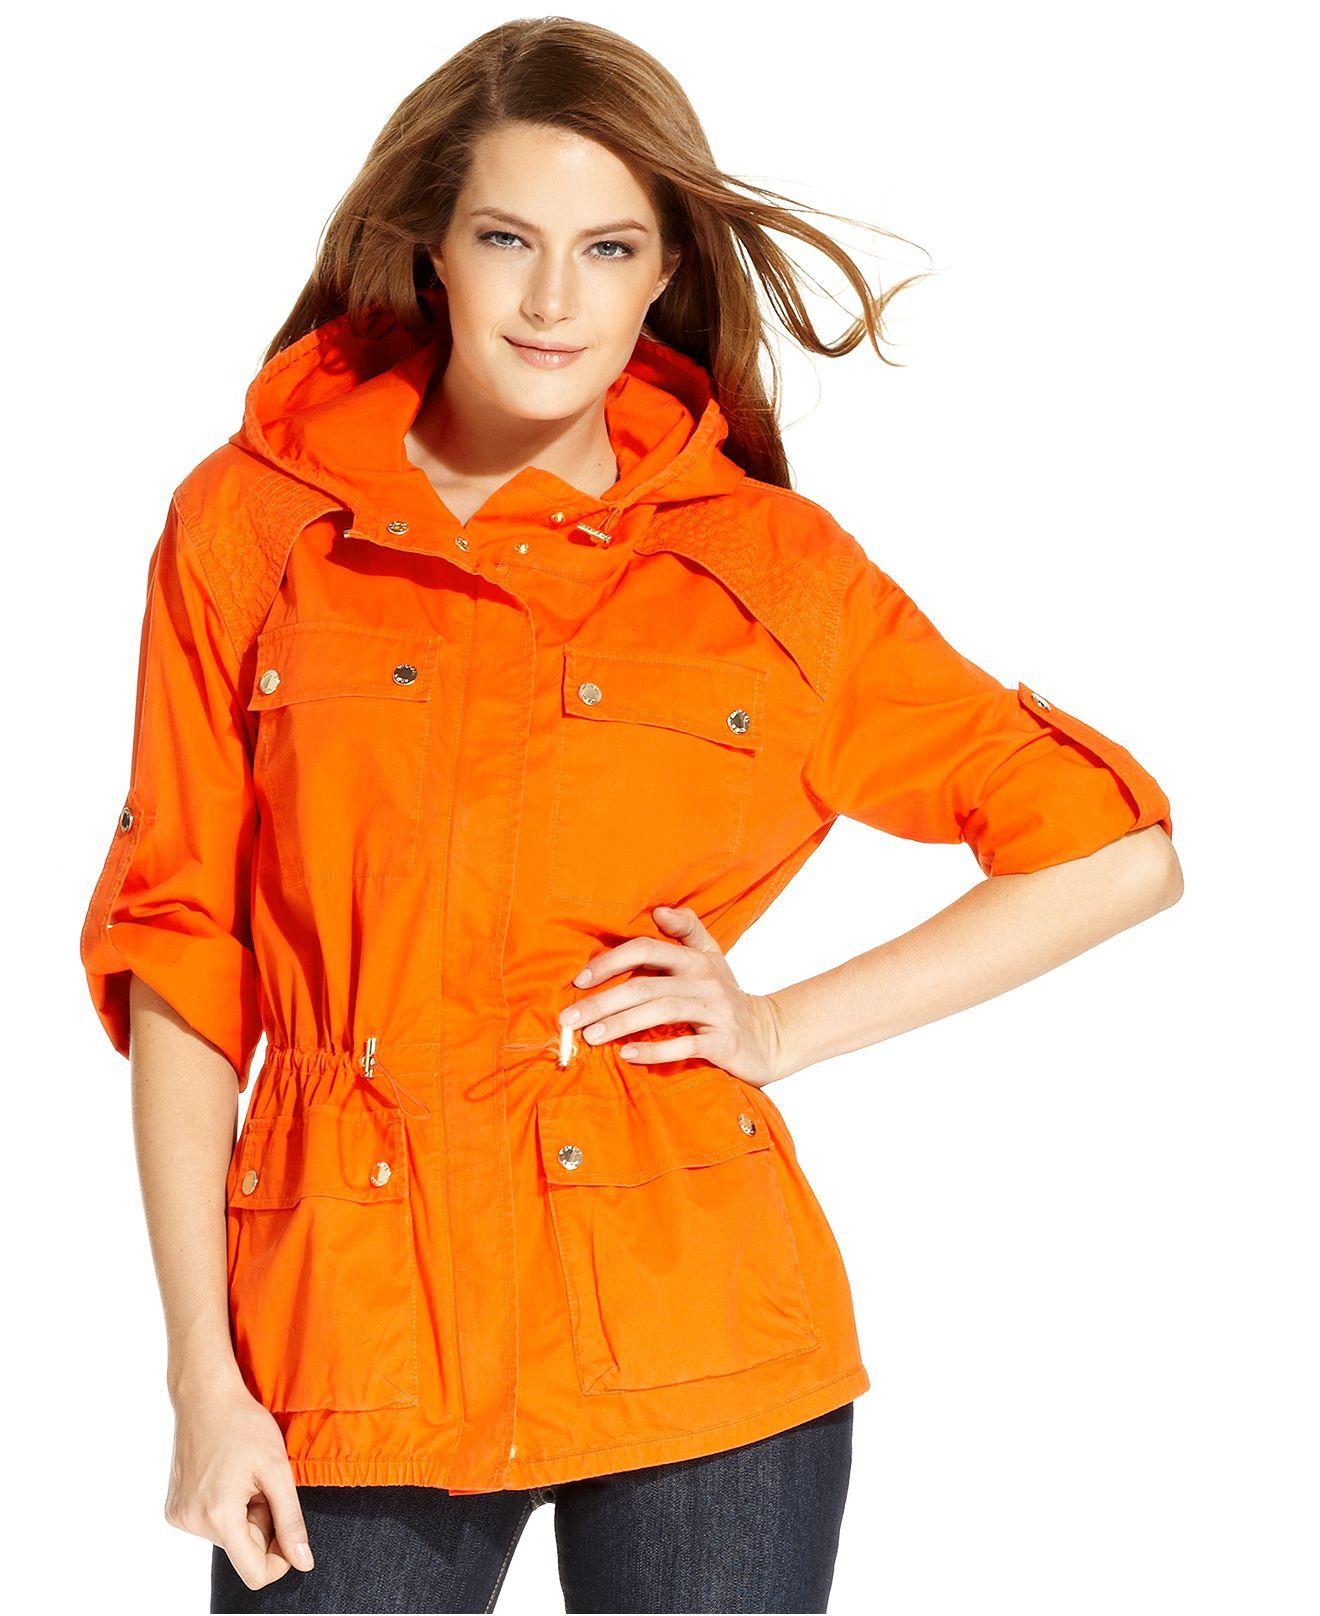 MICHAEL Michael Kor Petite Jacket, Hooded Drawstring